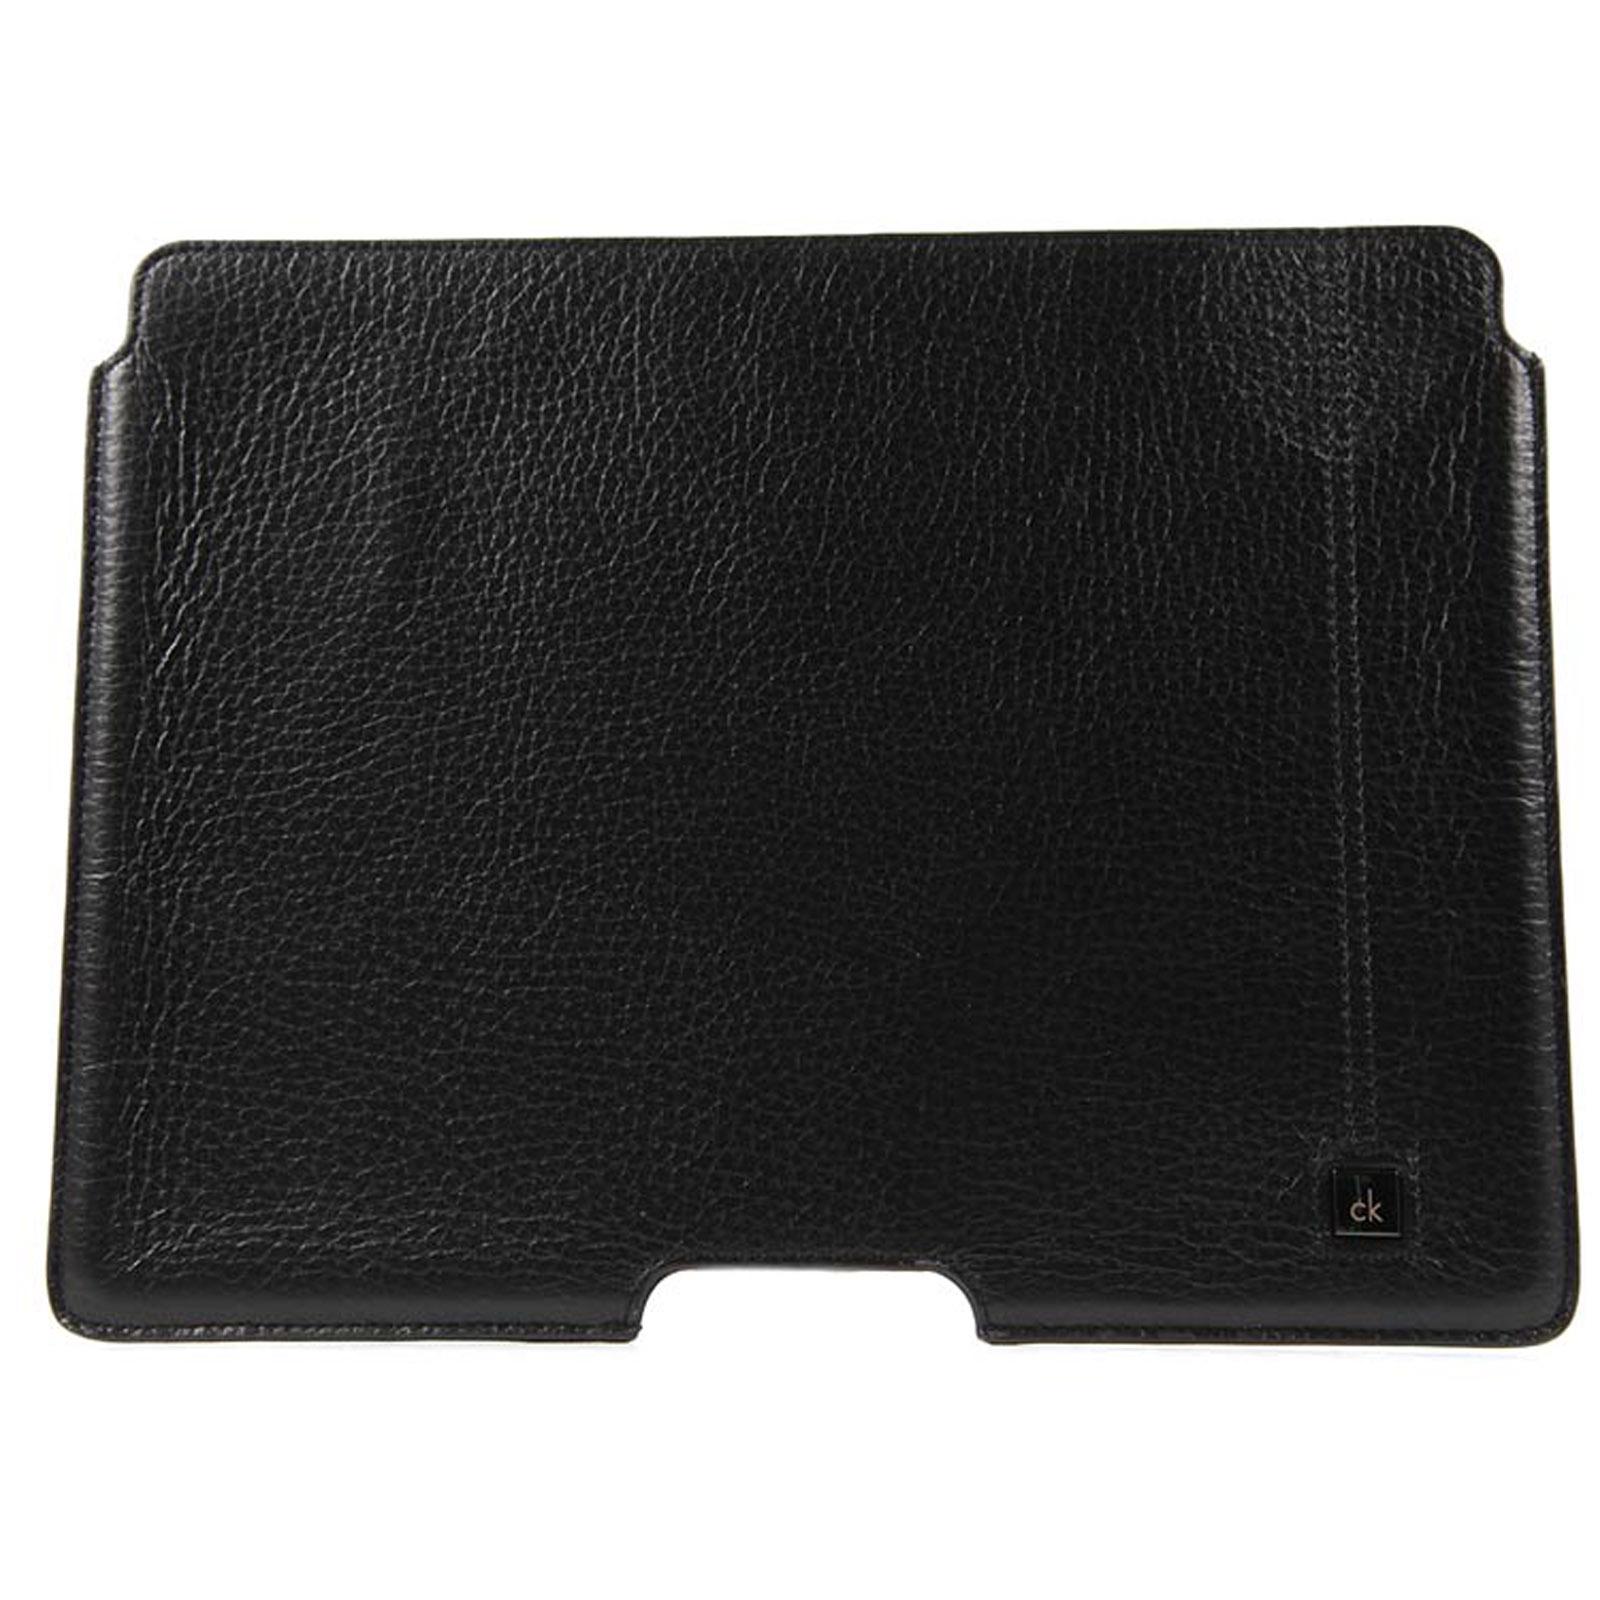 Smart cover case custodia new ipad 3 4 pelle philippe